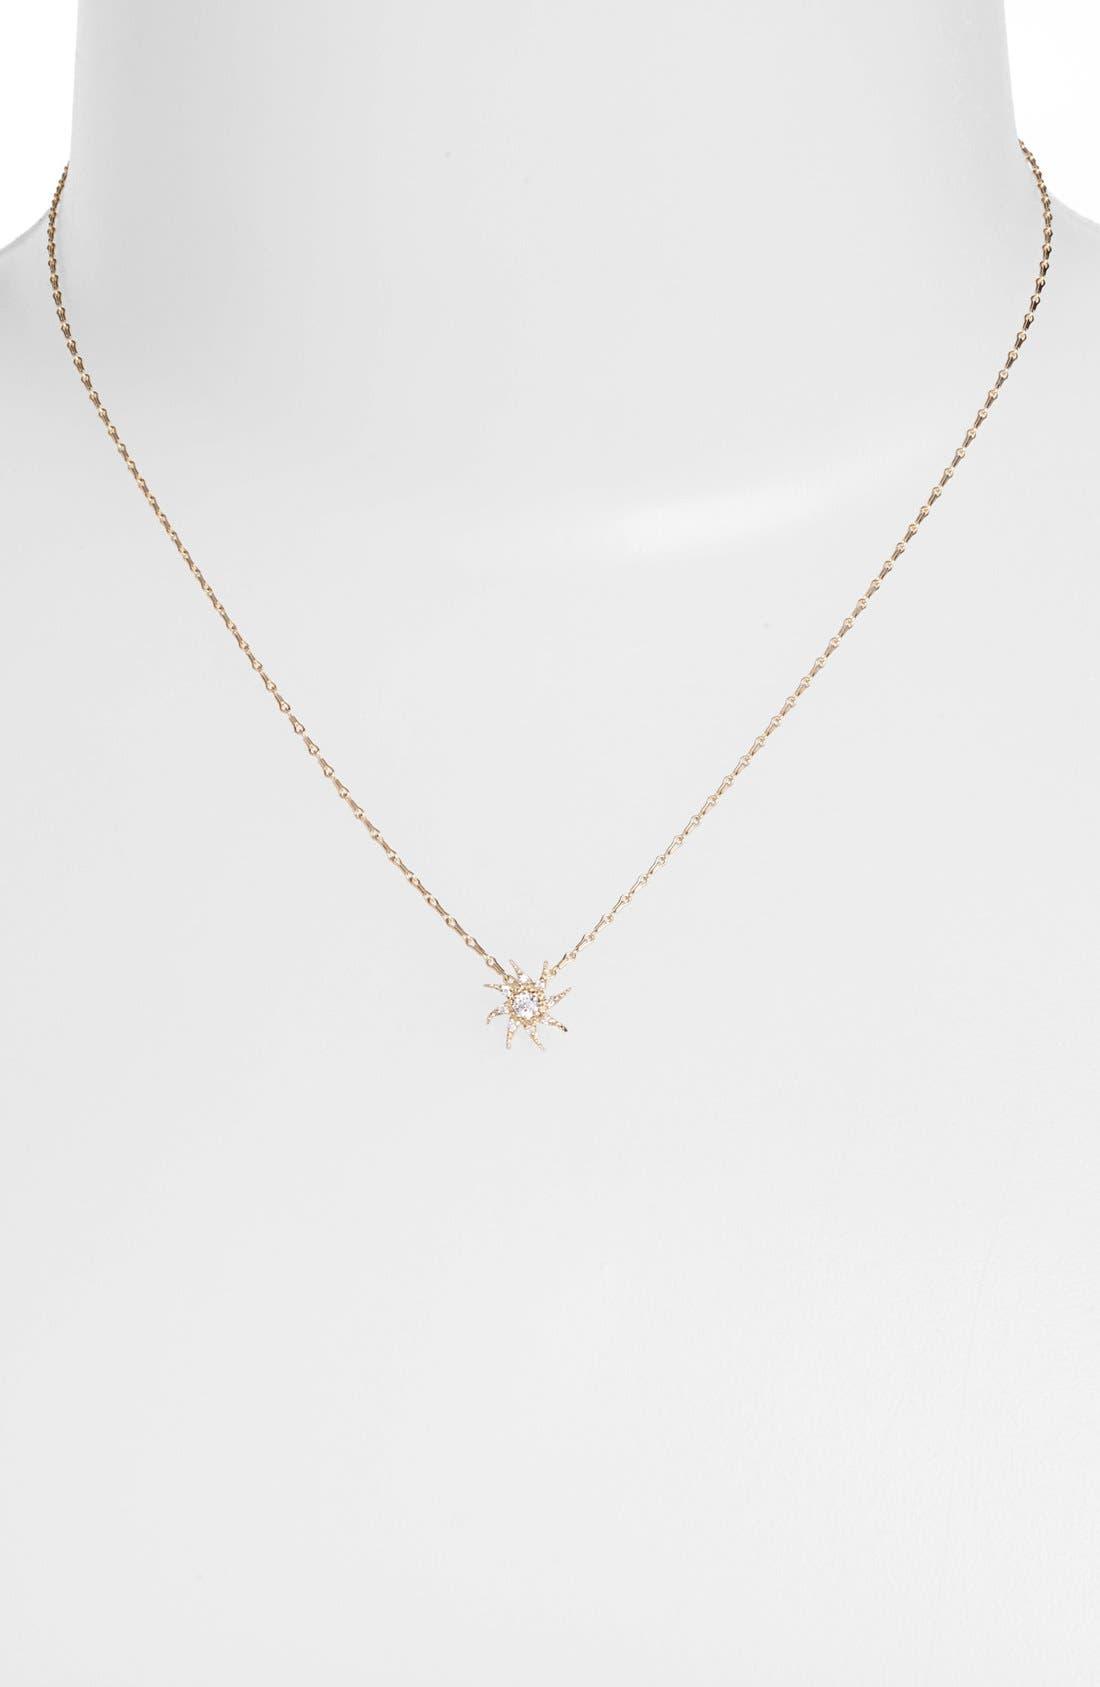 Alternate Image 1 Selected - Mizuki 'Wings of Desire' Diamond Sun Pendant Necklace